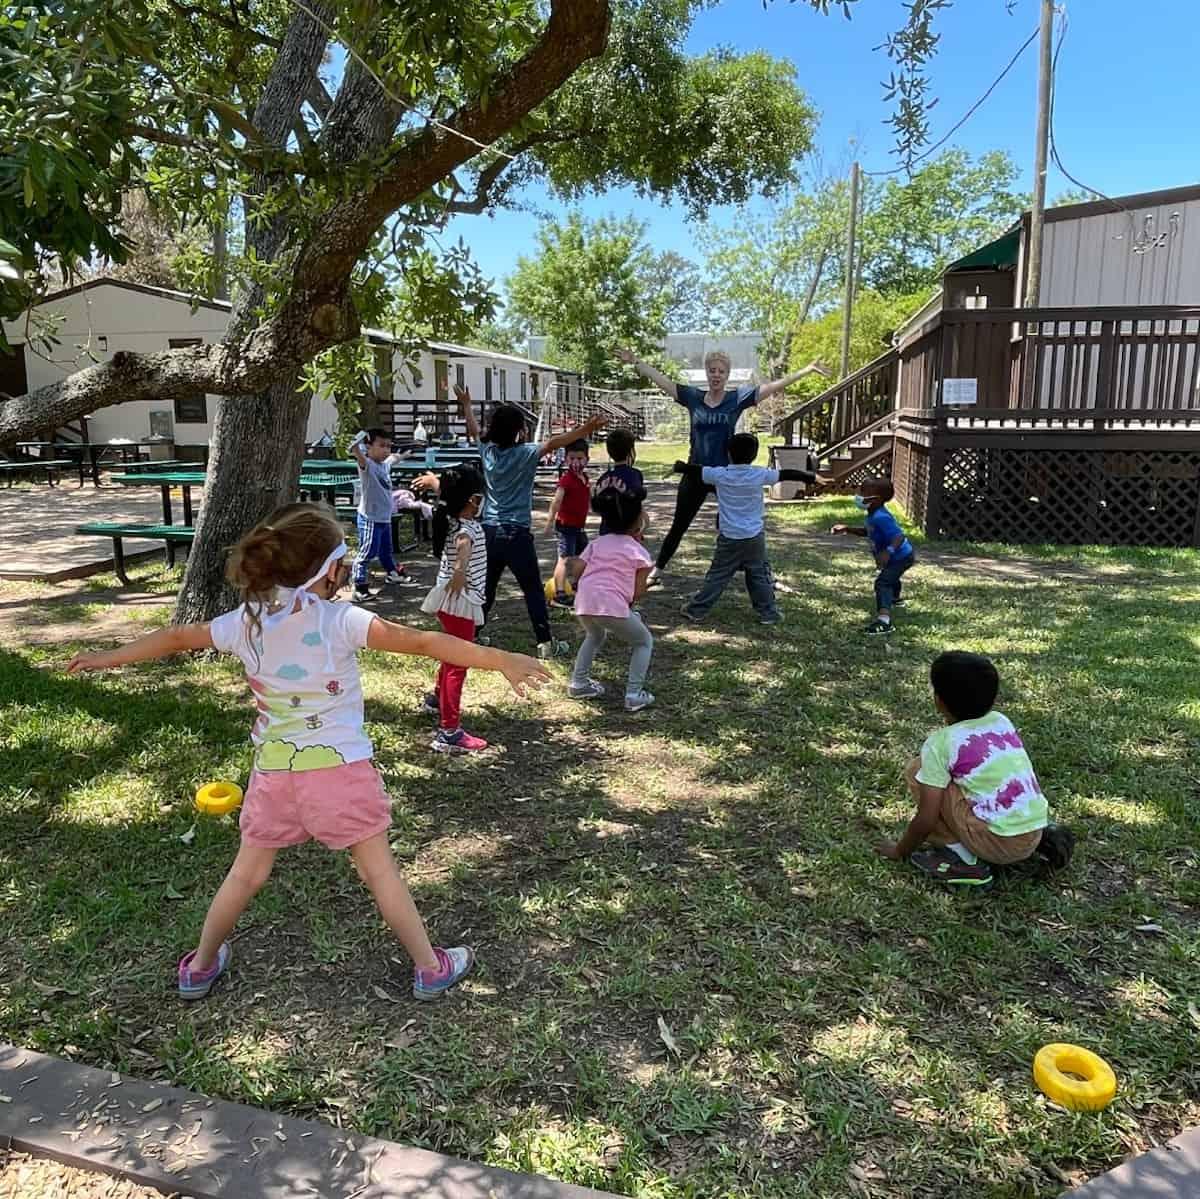 Kids Playing at Rainard School